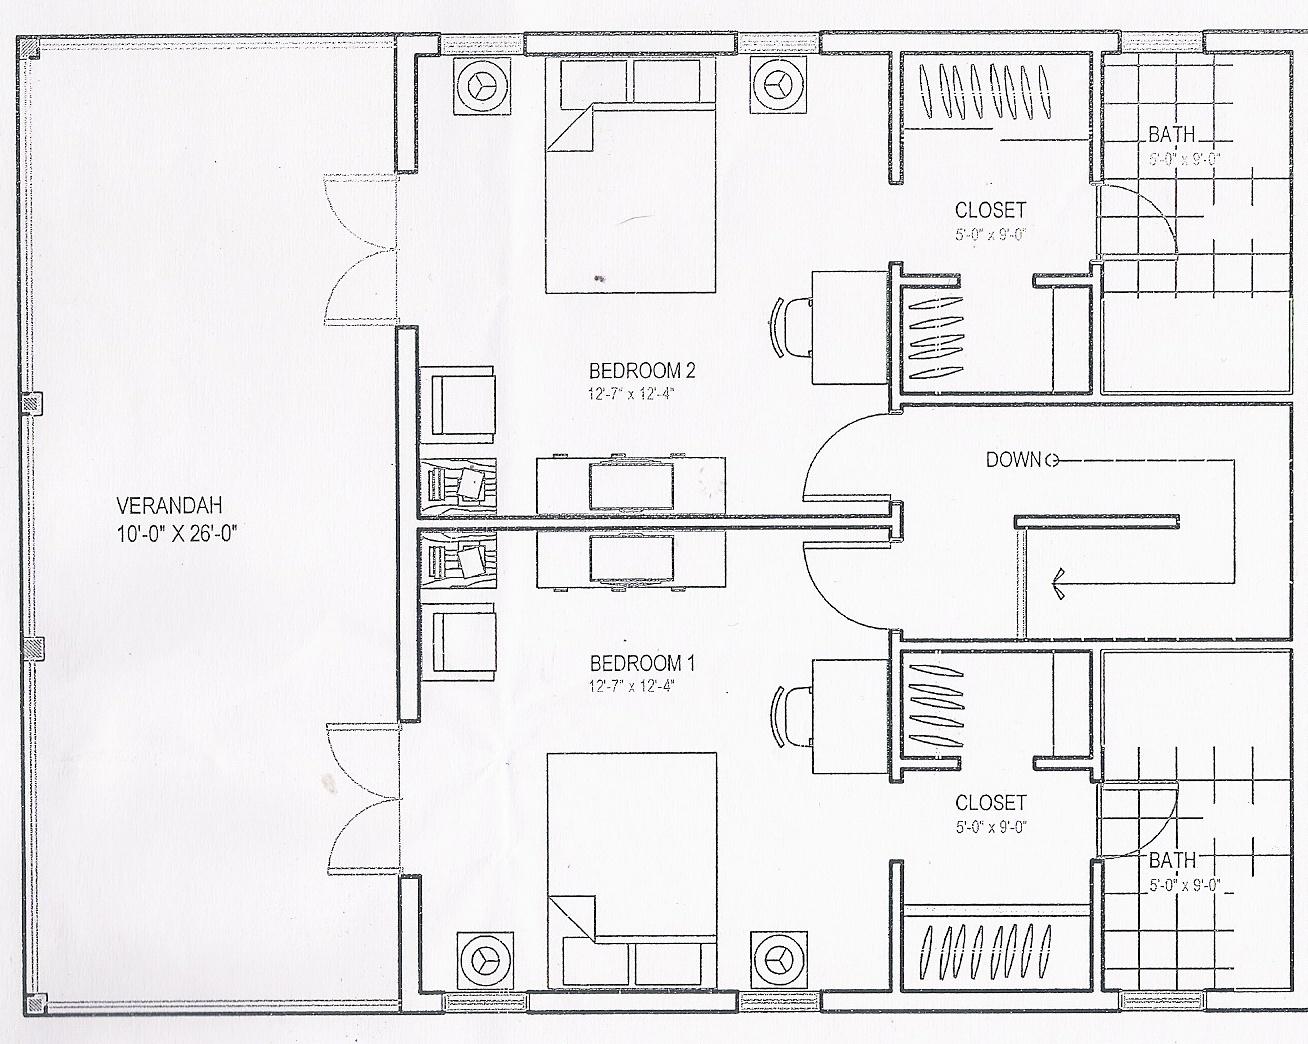 Upstairs Drawing of Condo